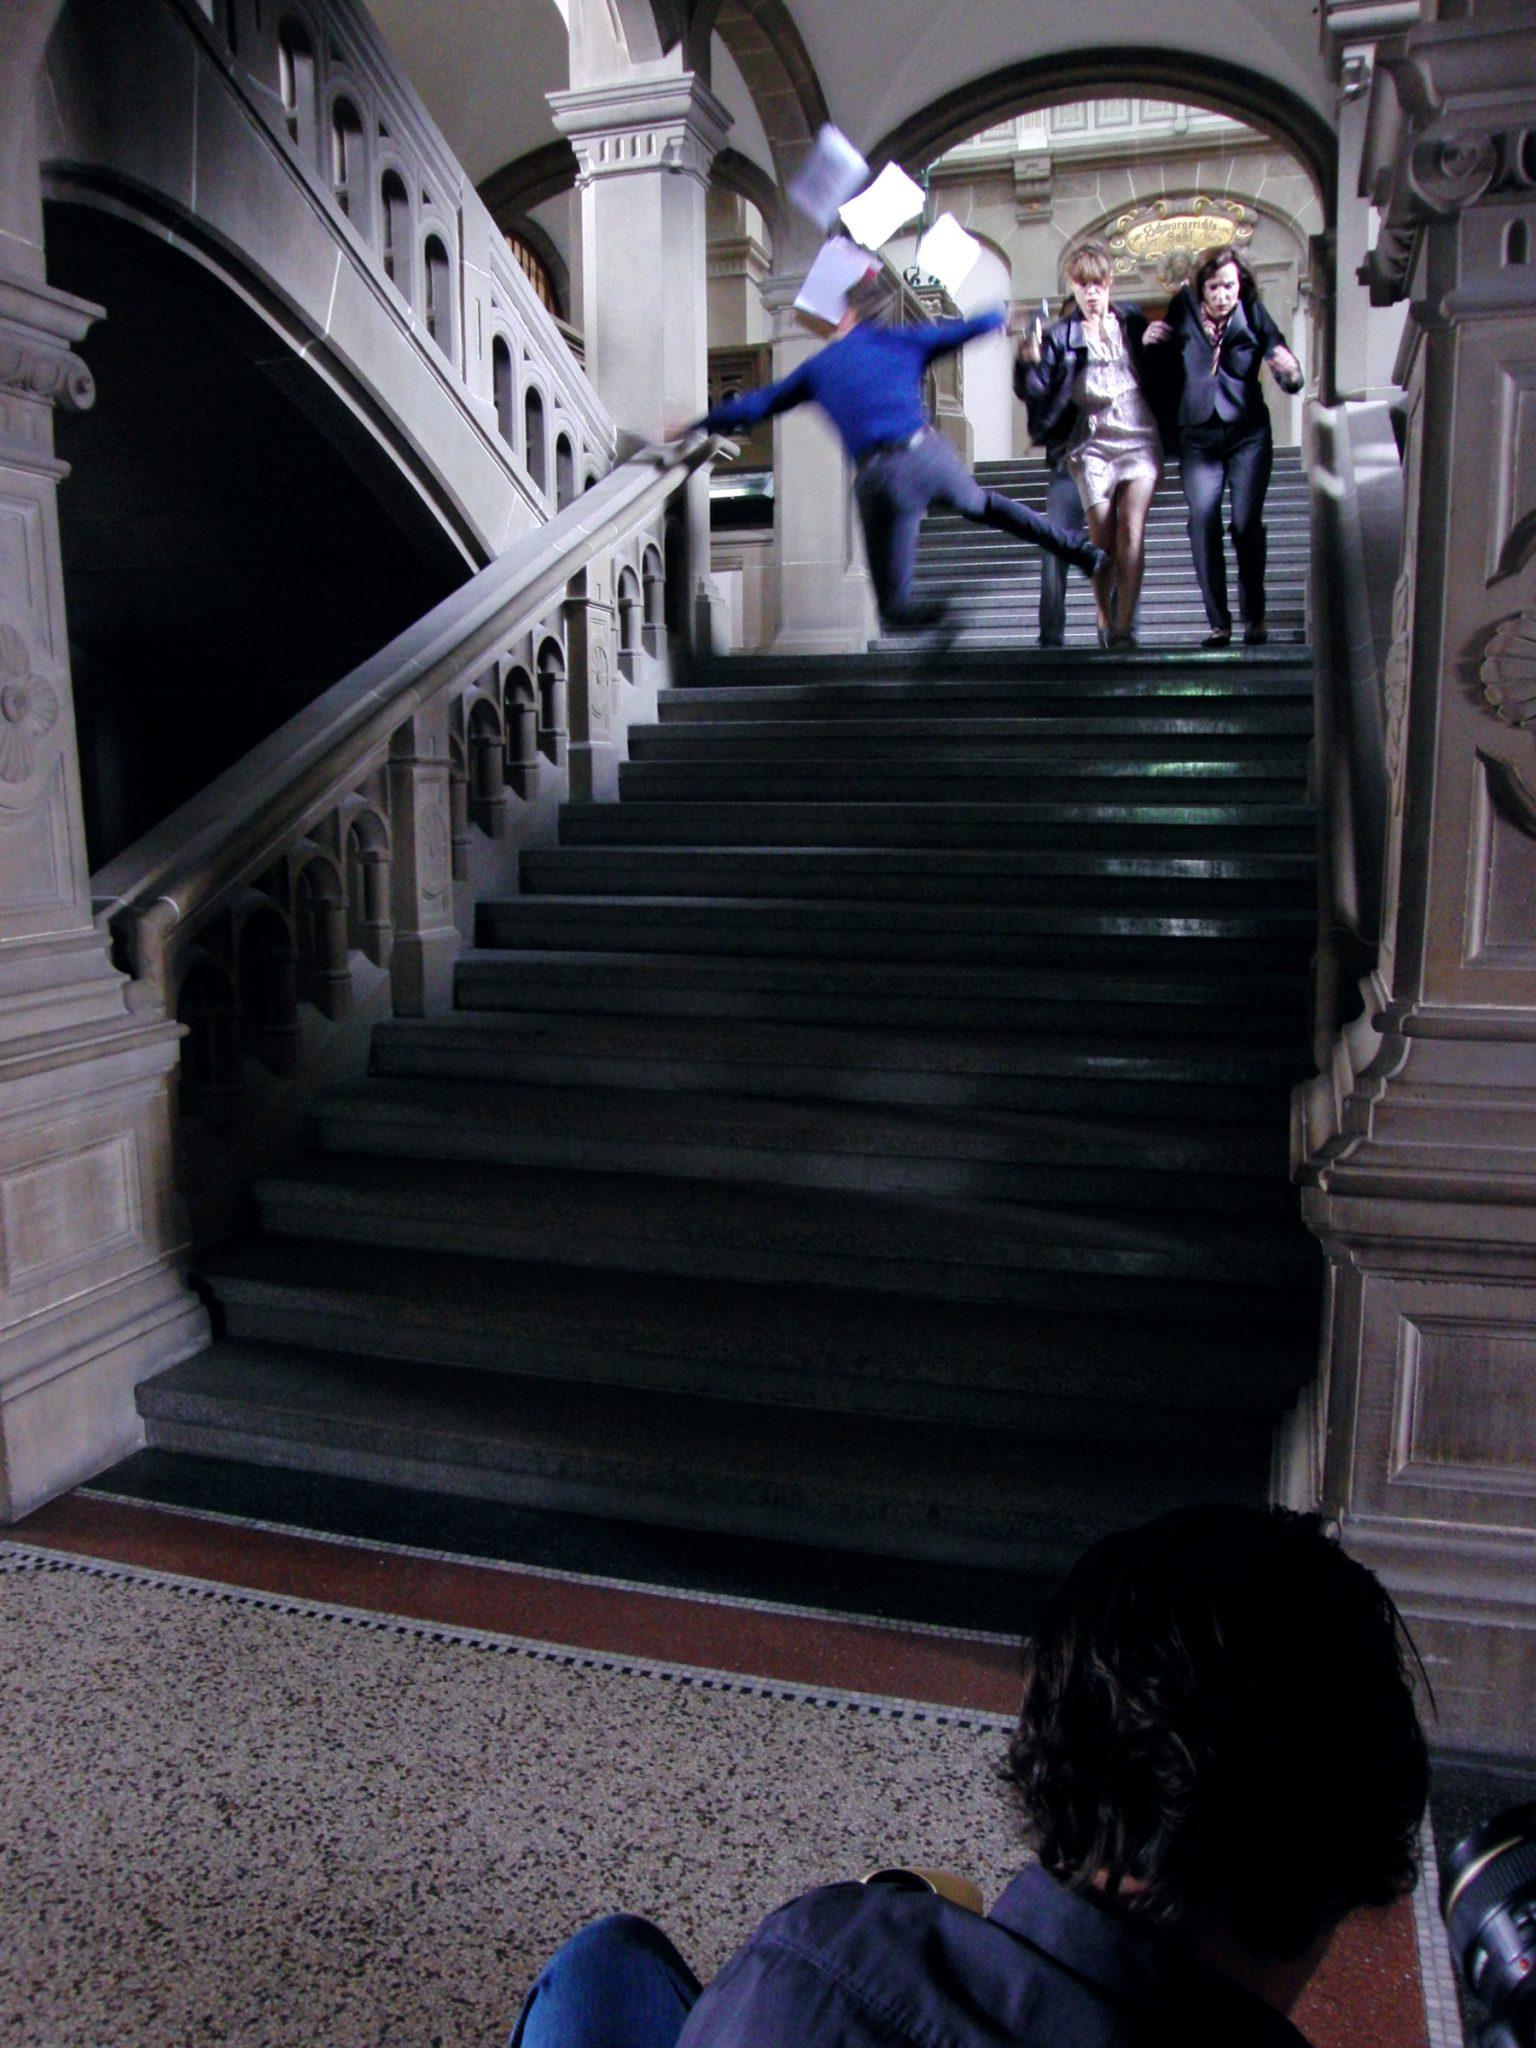 Martin Goeres, Stunt, Movie, Treppensturz